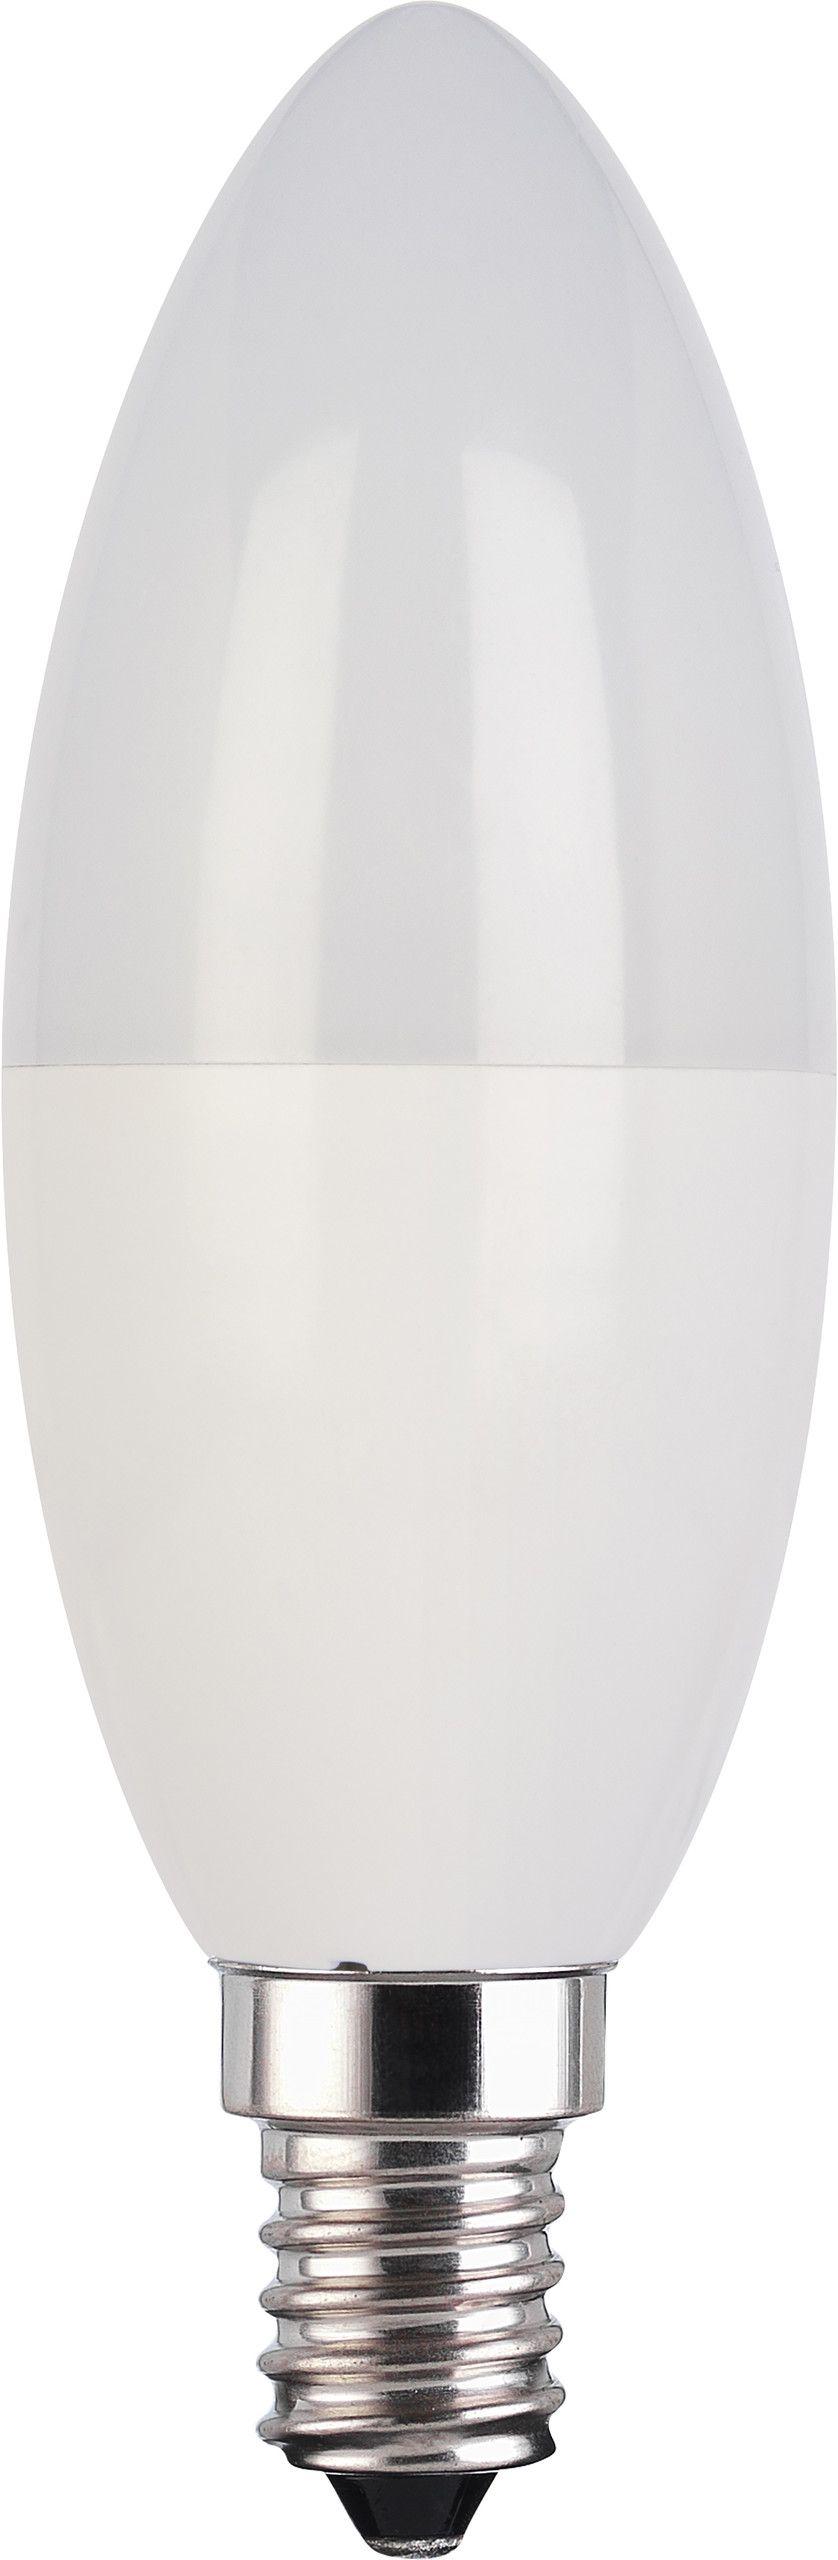 TCP Smart LED Lamp Classic White E14